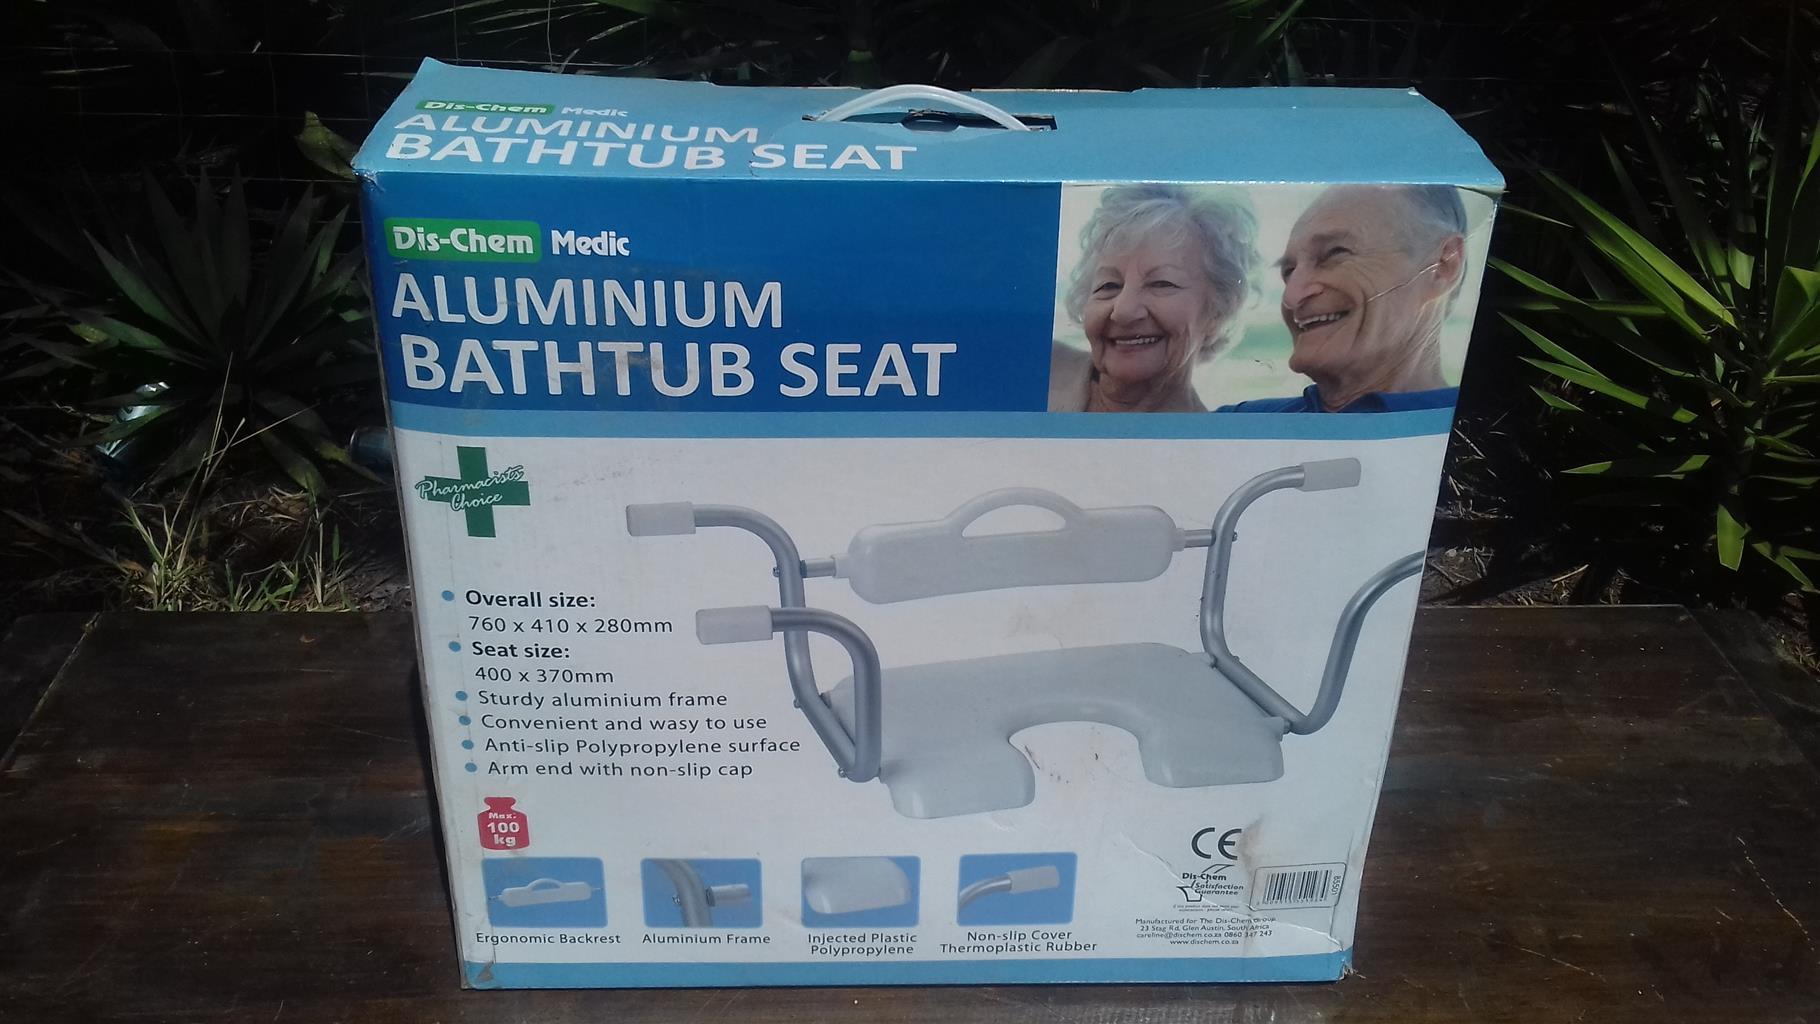 Aluminium bath seat